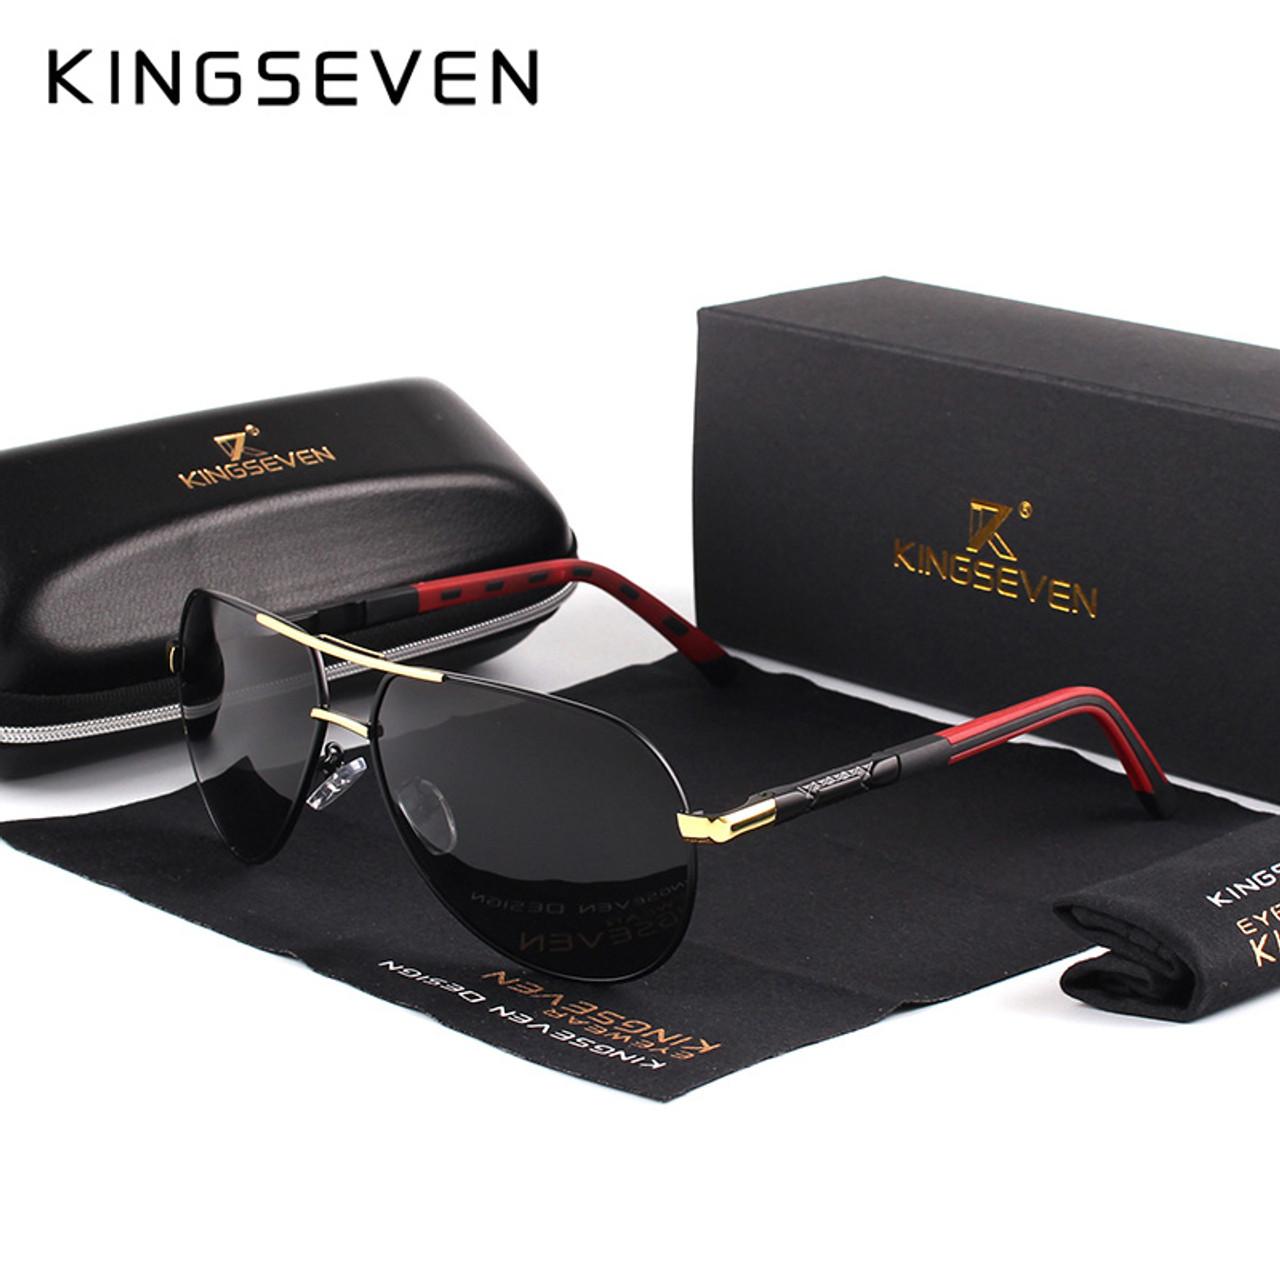 7147186d187 KINGSEVEN Men Vintage Aluminum HD Polarized Sunglasses Classic Brand Sun  glasses Coating Lens Driving Shades For Men Wome - OnshopDeals.Com